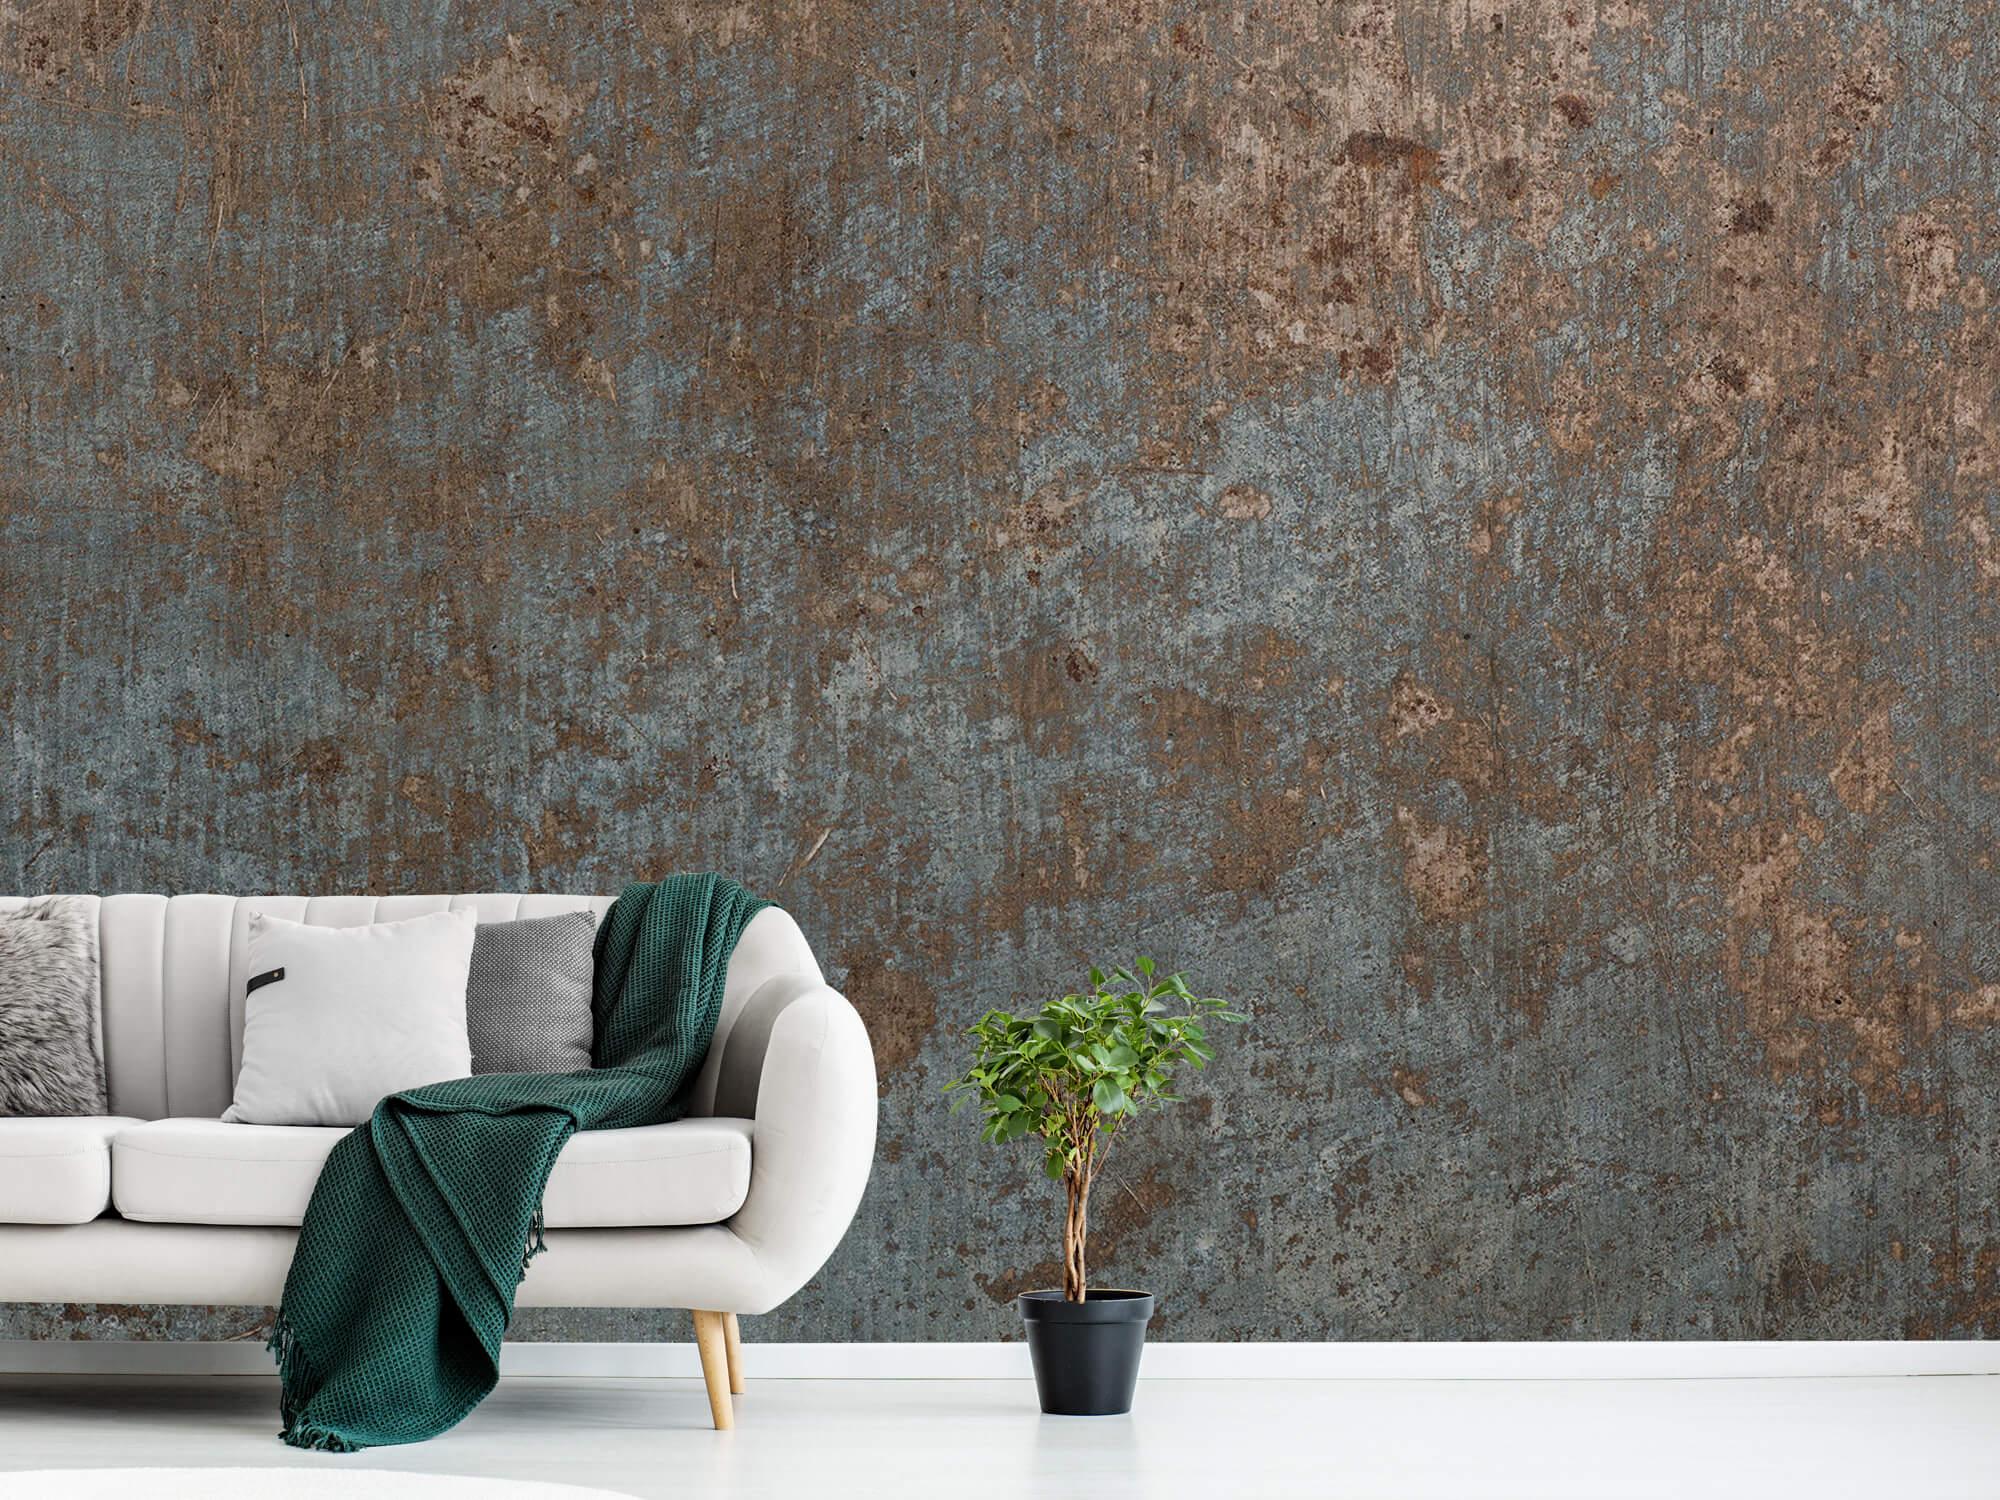 Texturen Farbstruktur Kupfer 8